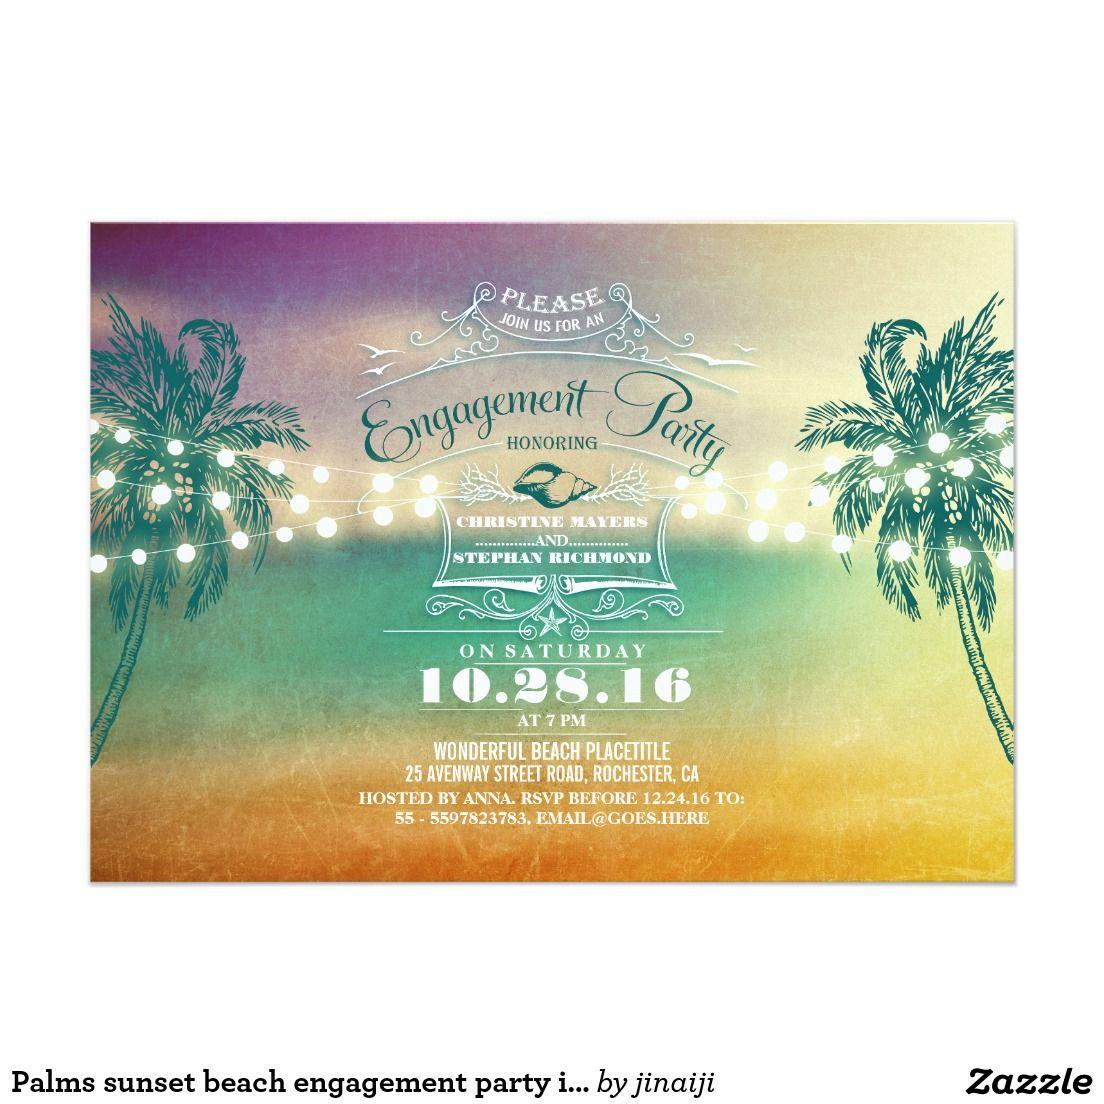 Palms sunset beach engagement party invitations | Wedding ...